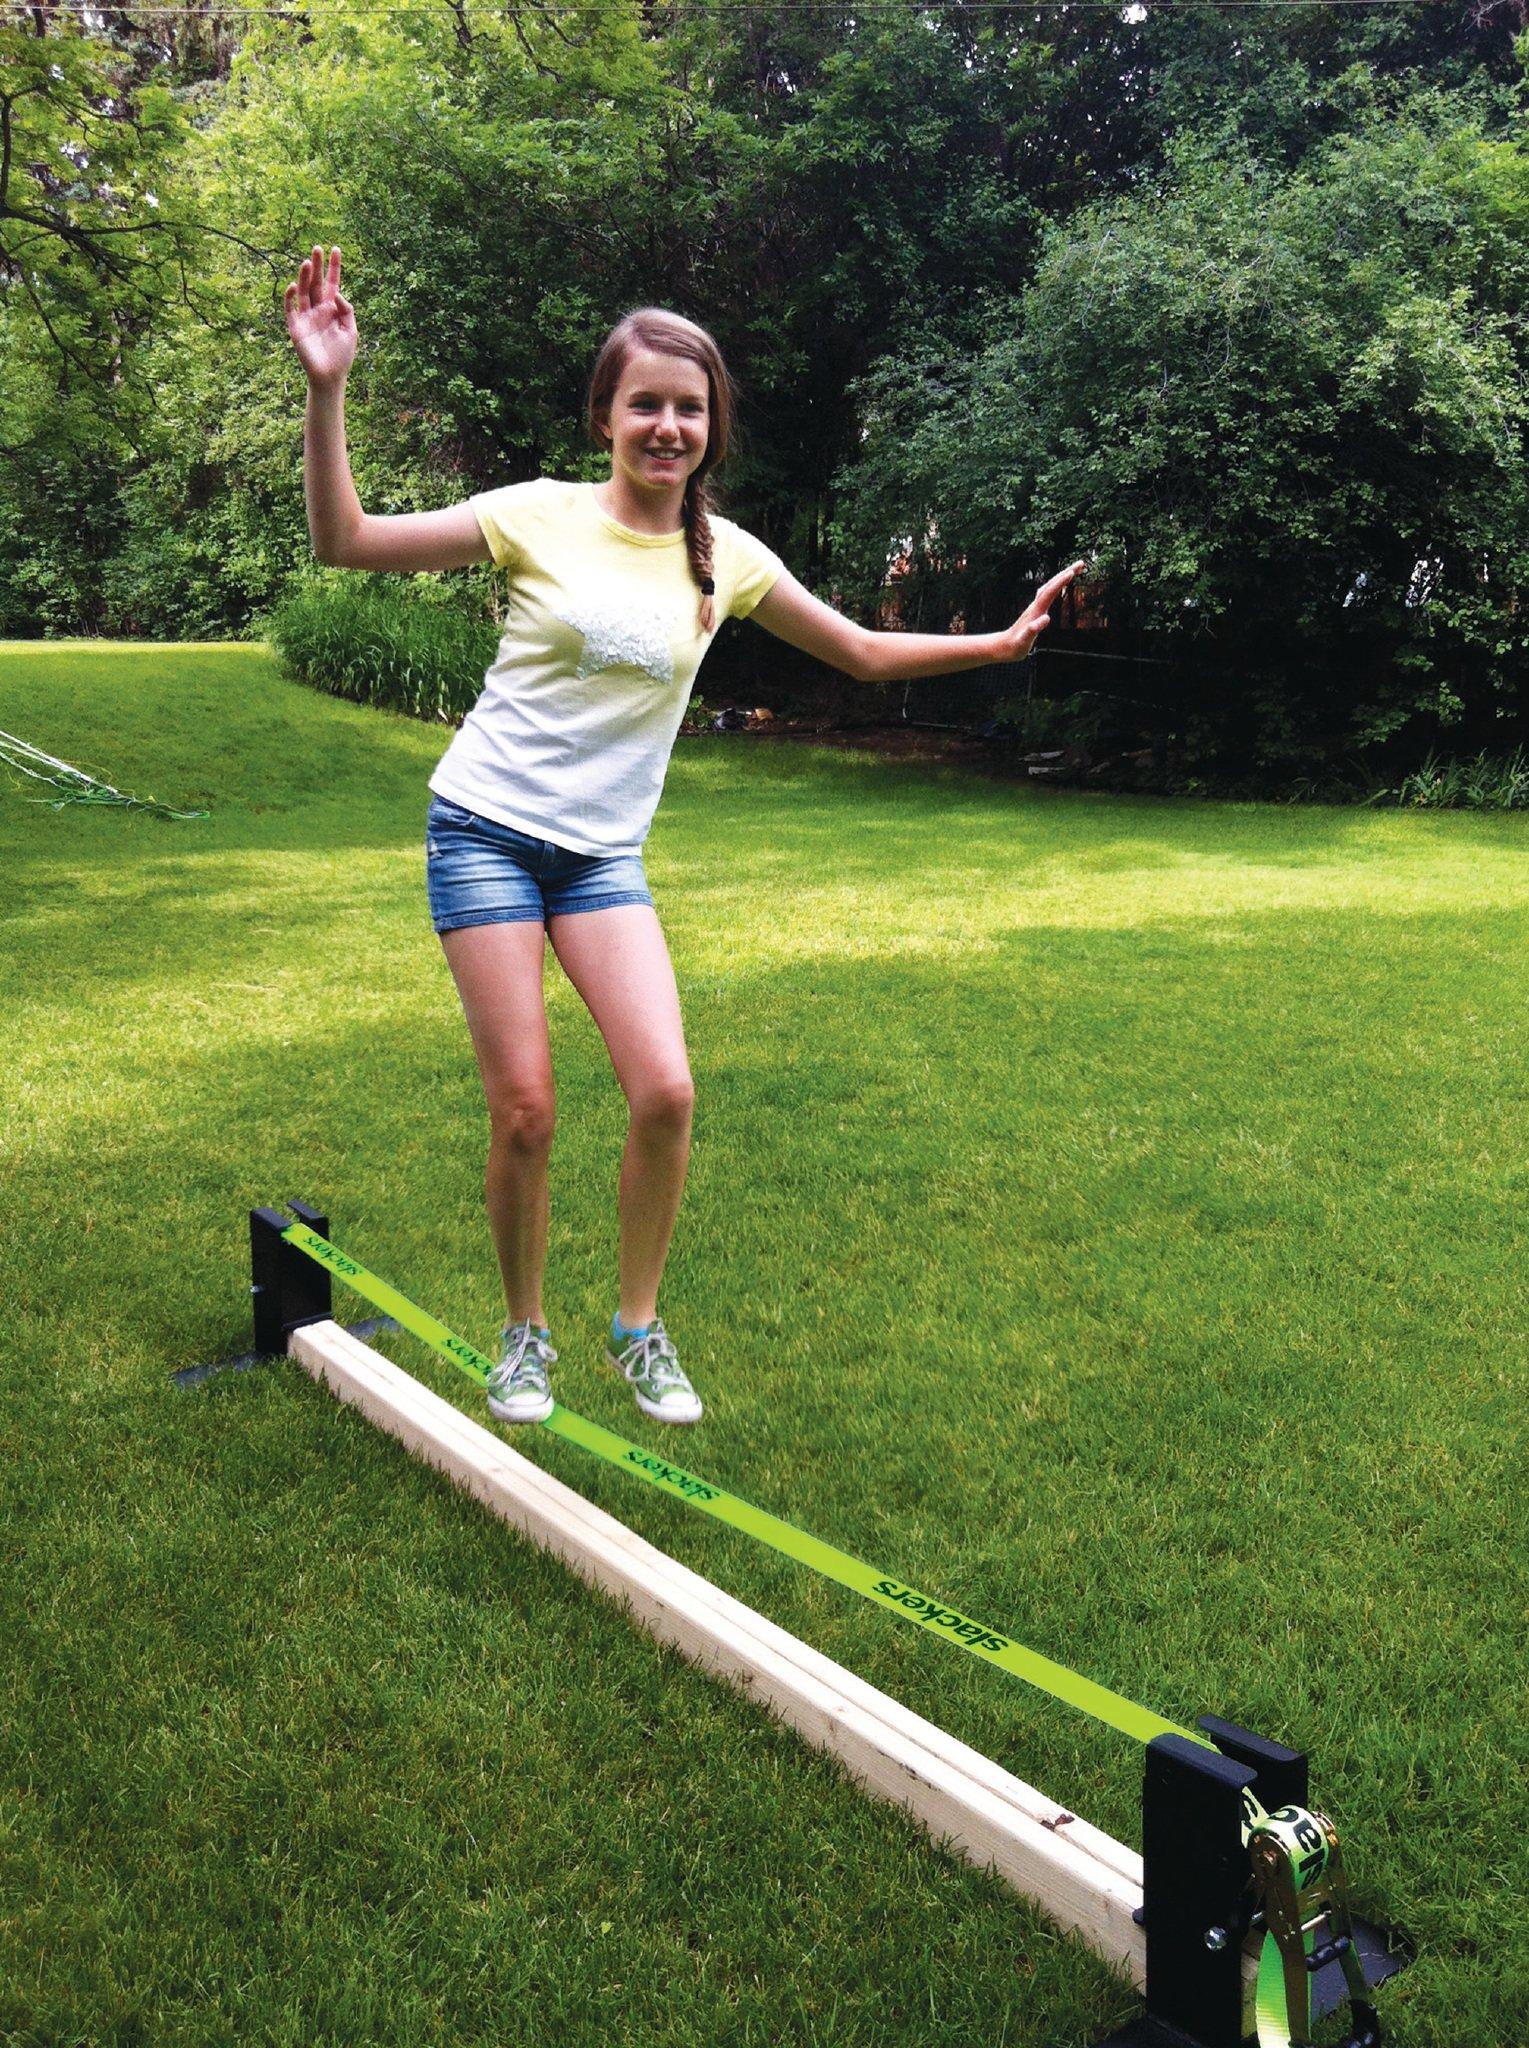 slackers Slackline Rack, 12-Feet by Slackers